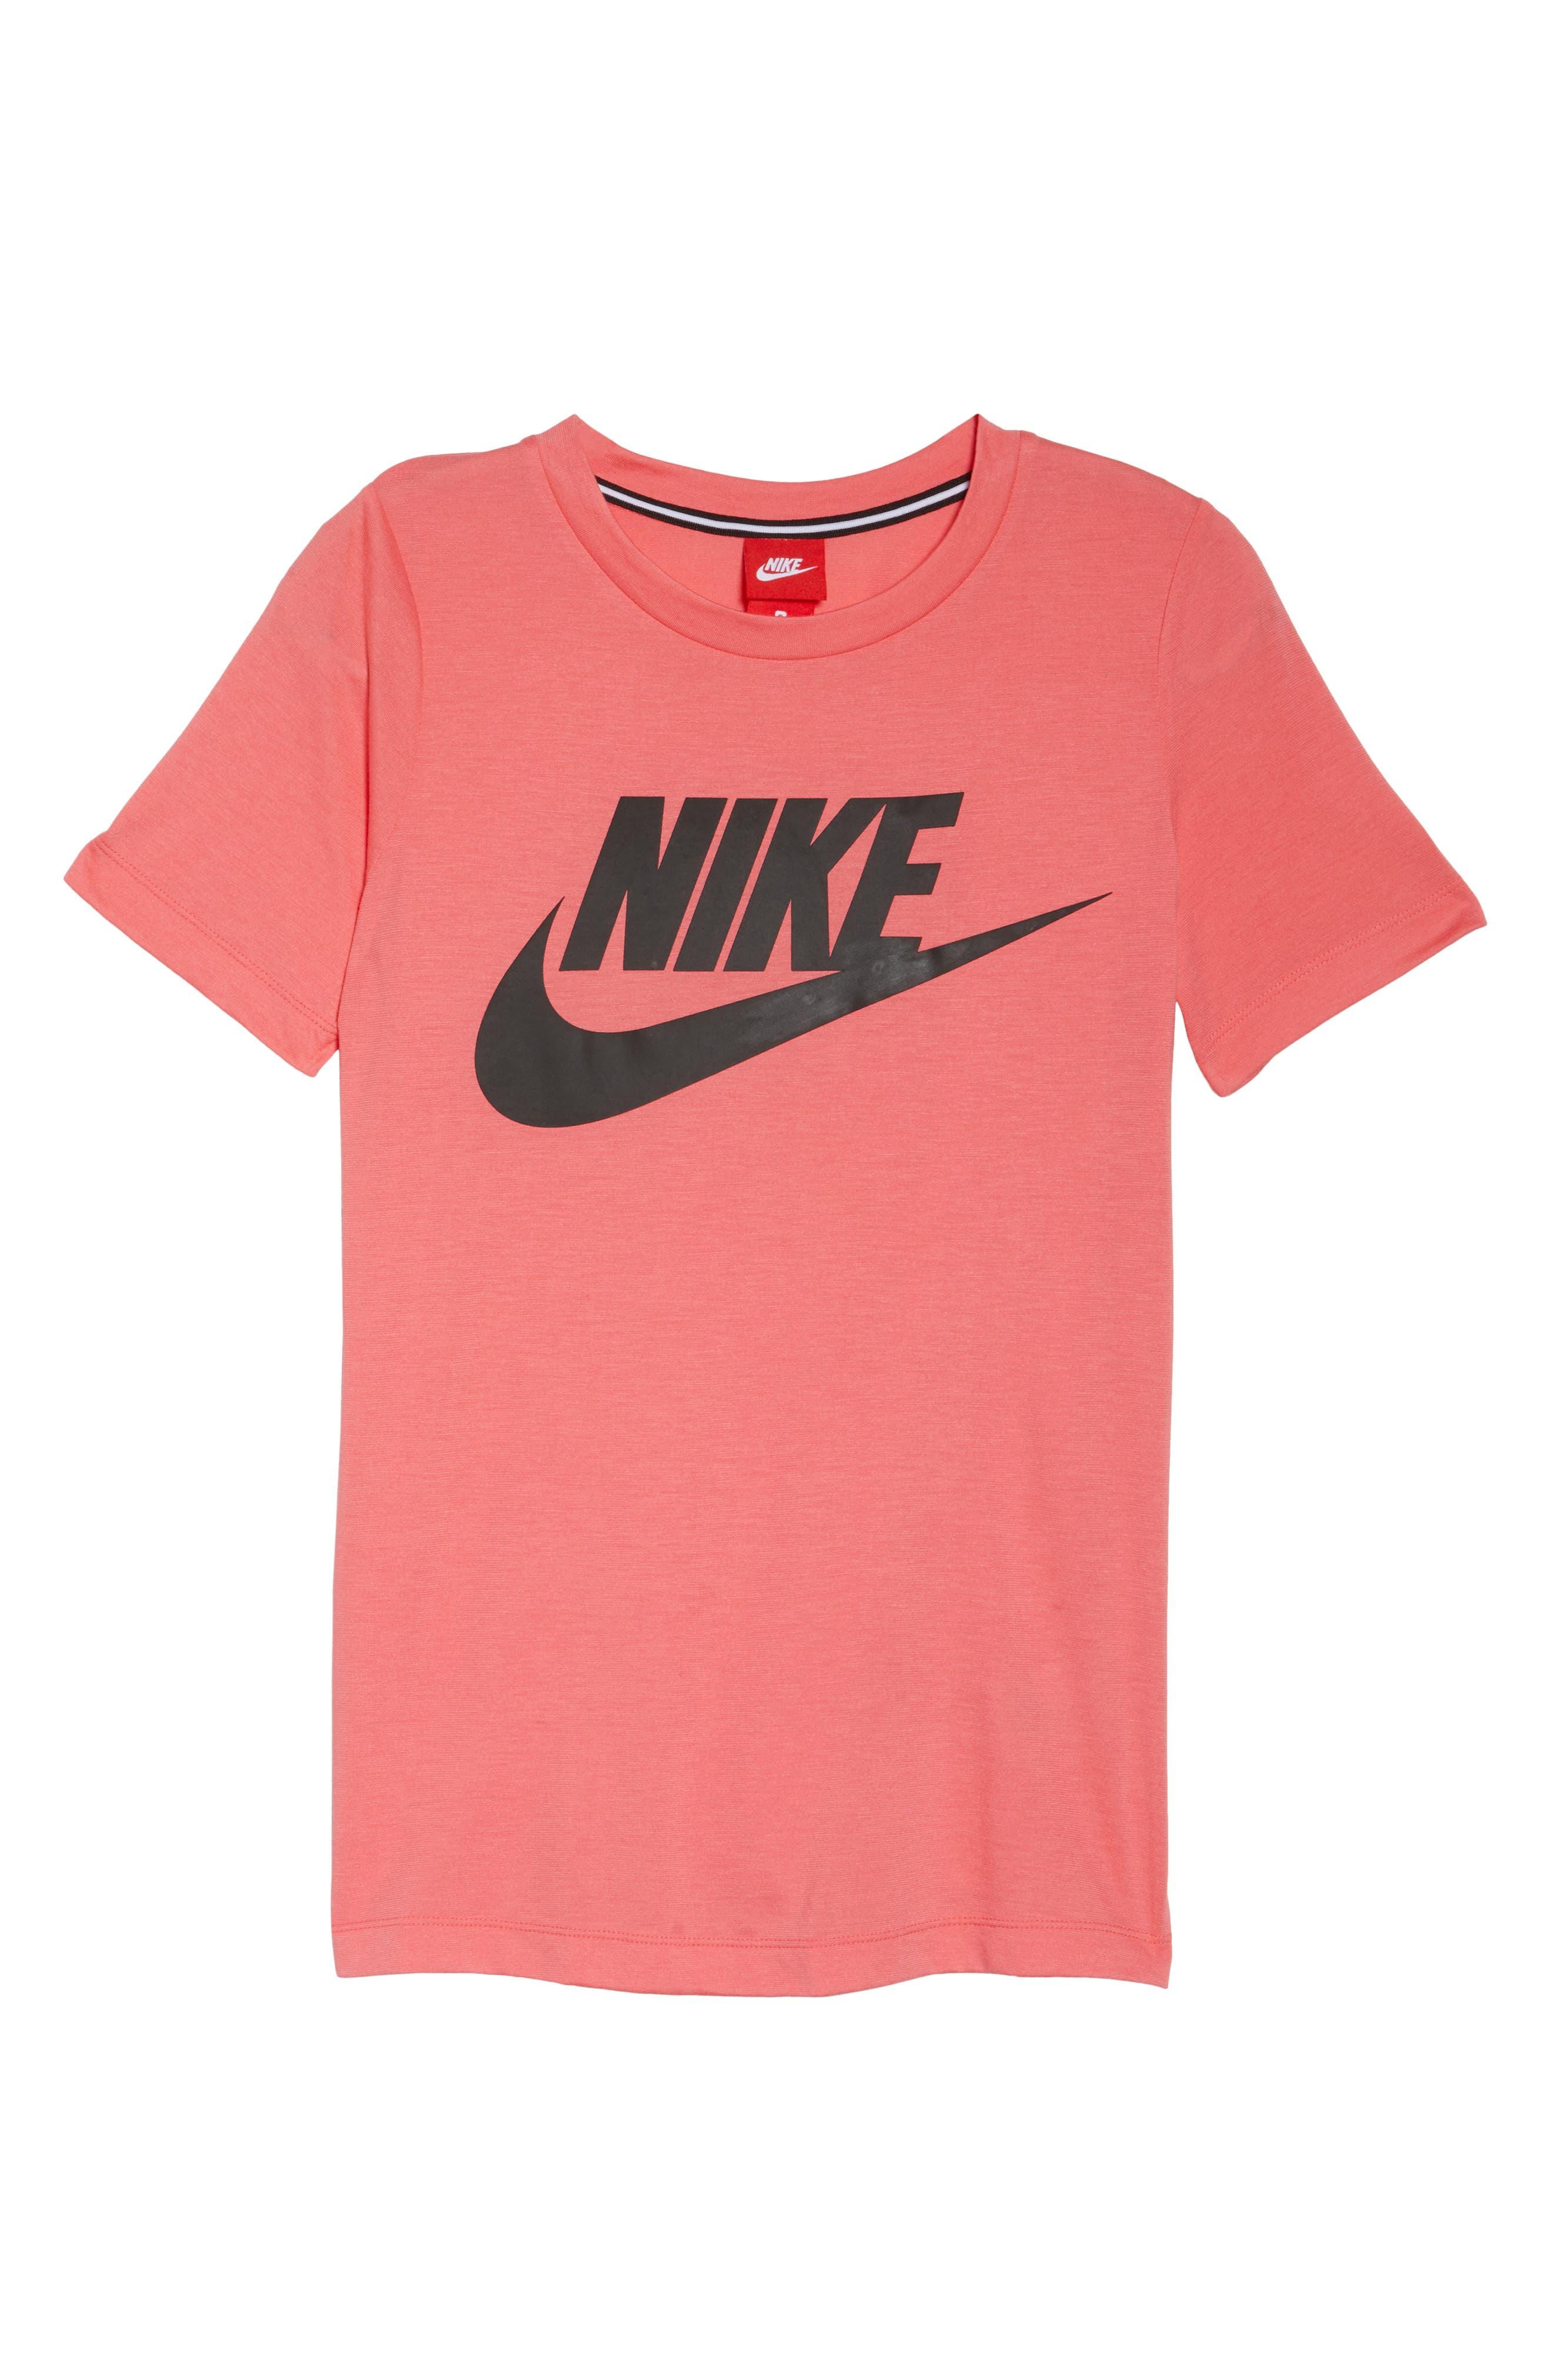 Sportswear Essential Tee,                             Alternate thumbnail 7, color,                             Sea Coral/ Sea Coral/ Black